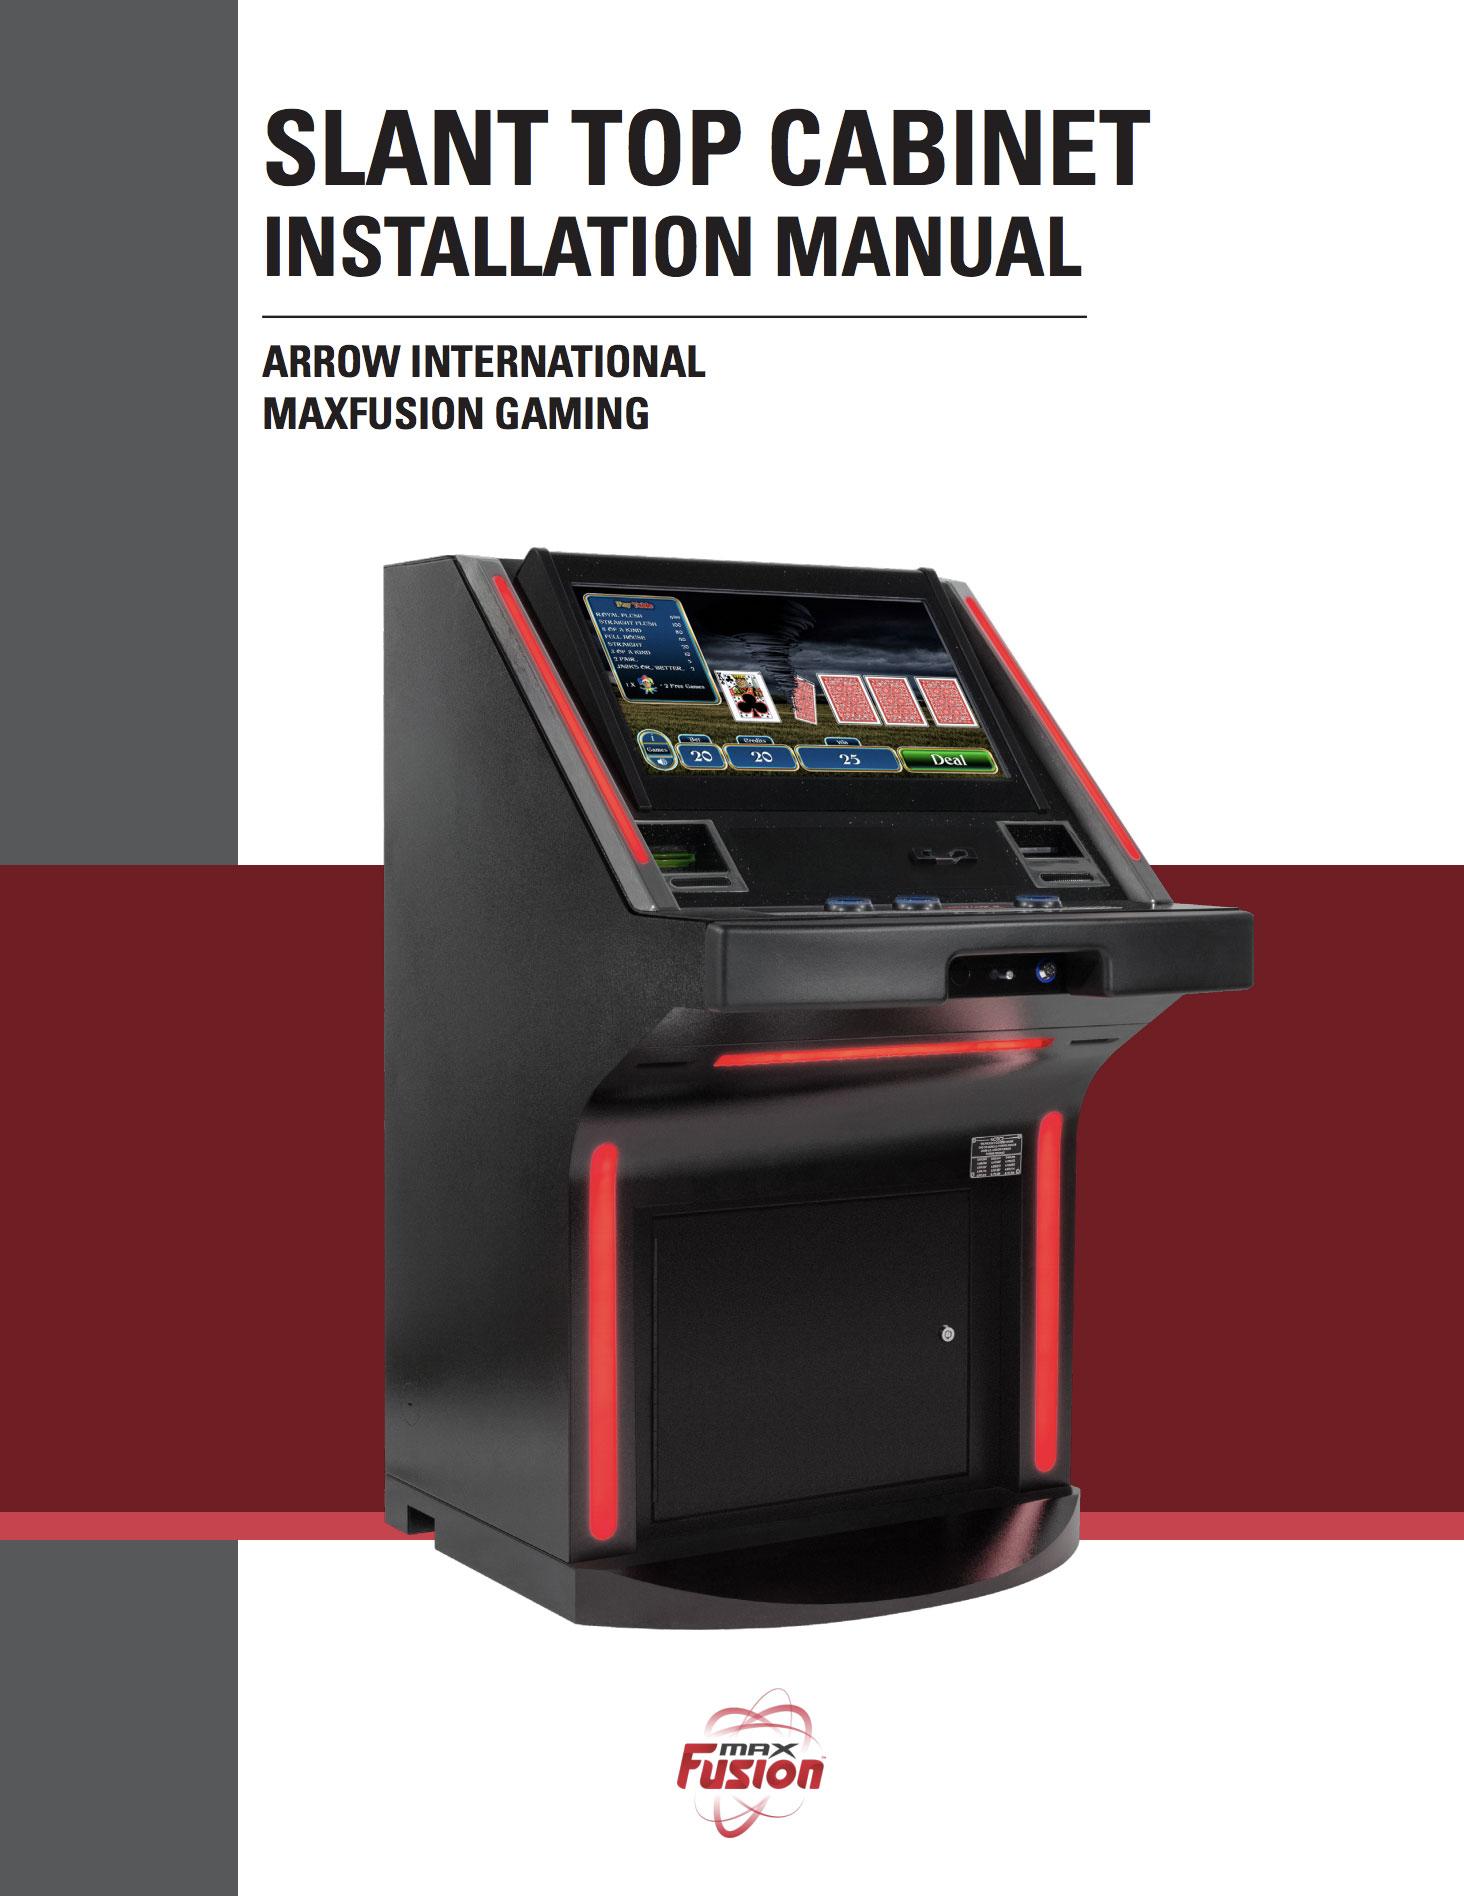 MaxFusion Slat Top Manual Equipment Manuals